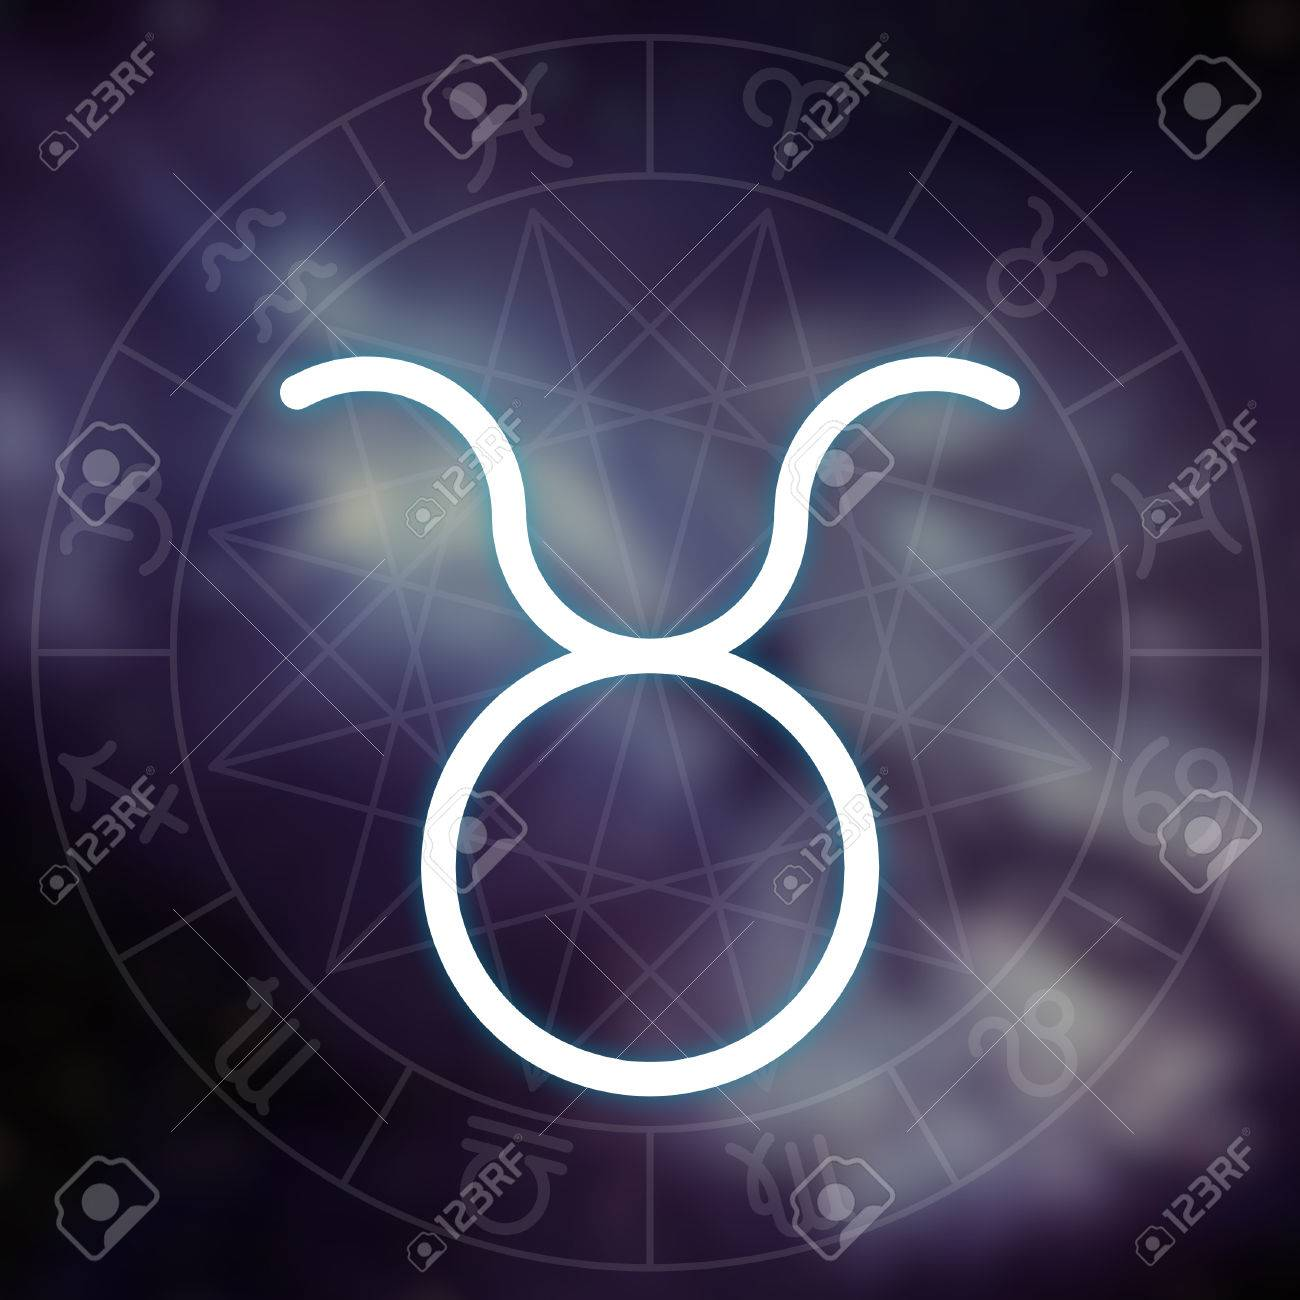 Zodiac Sign Taurus White Thin Simple Line Astrological Symbol